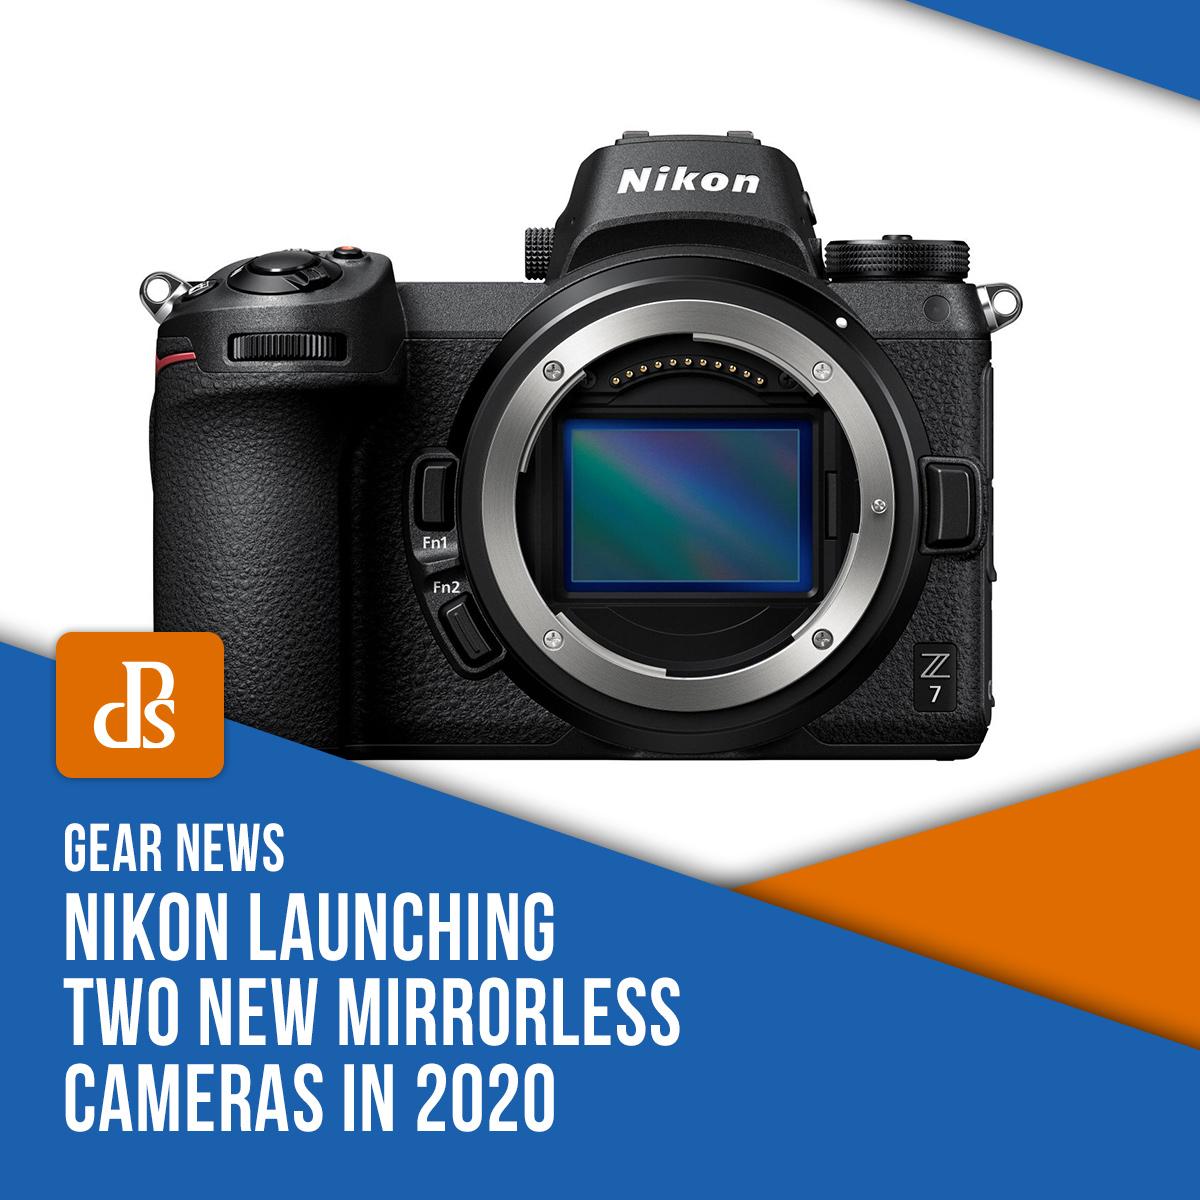 dps-new-nikon-mirrorless-news